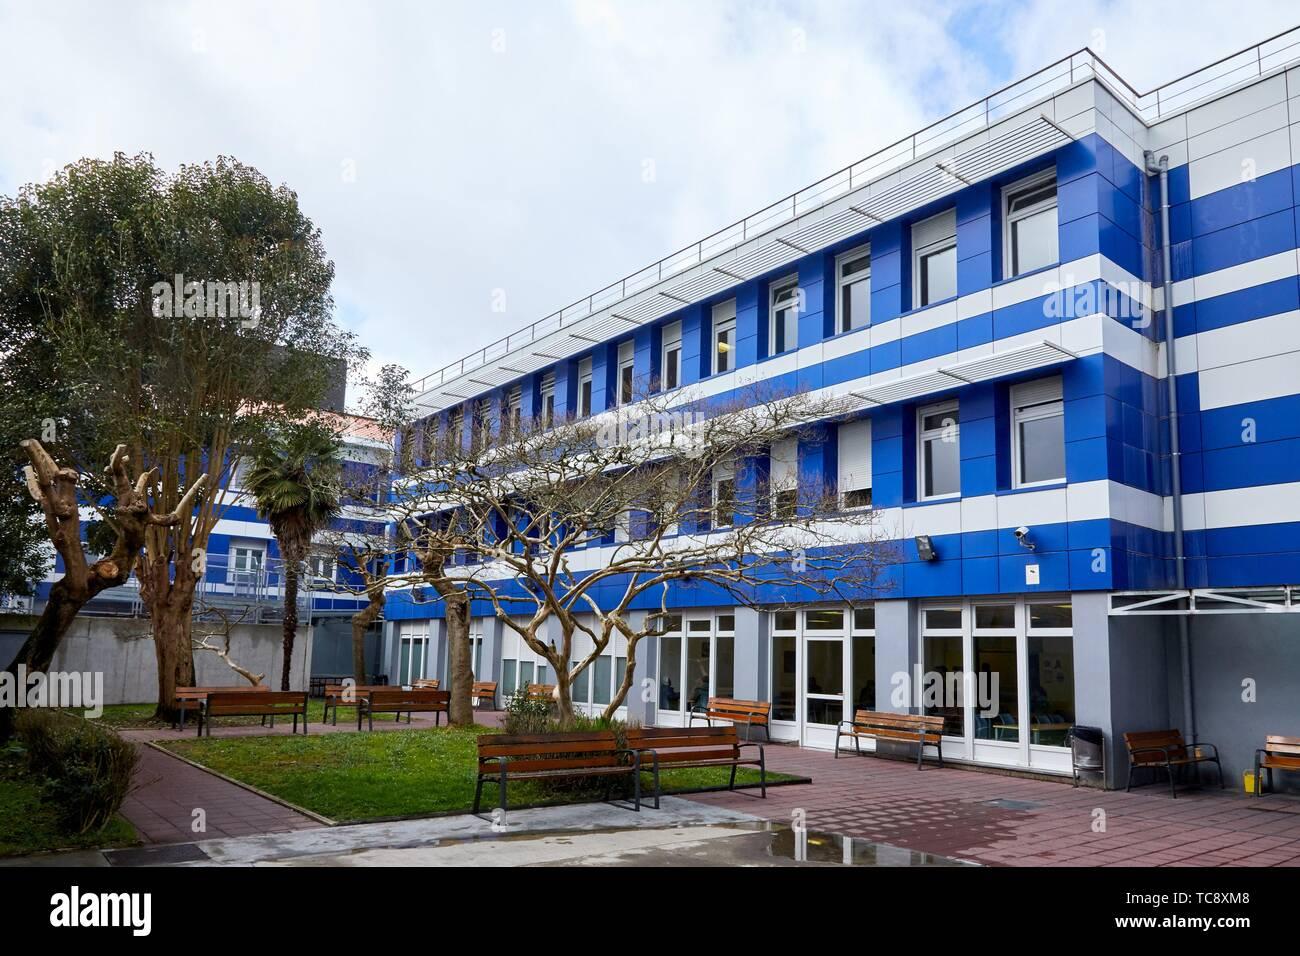 Psychiatry Building, Hospital Donostia, San Sebastian, Gipuzkoa, Basque Country, Spain - Stock Image